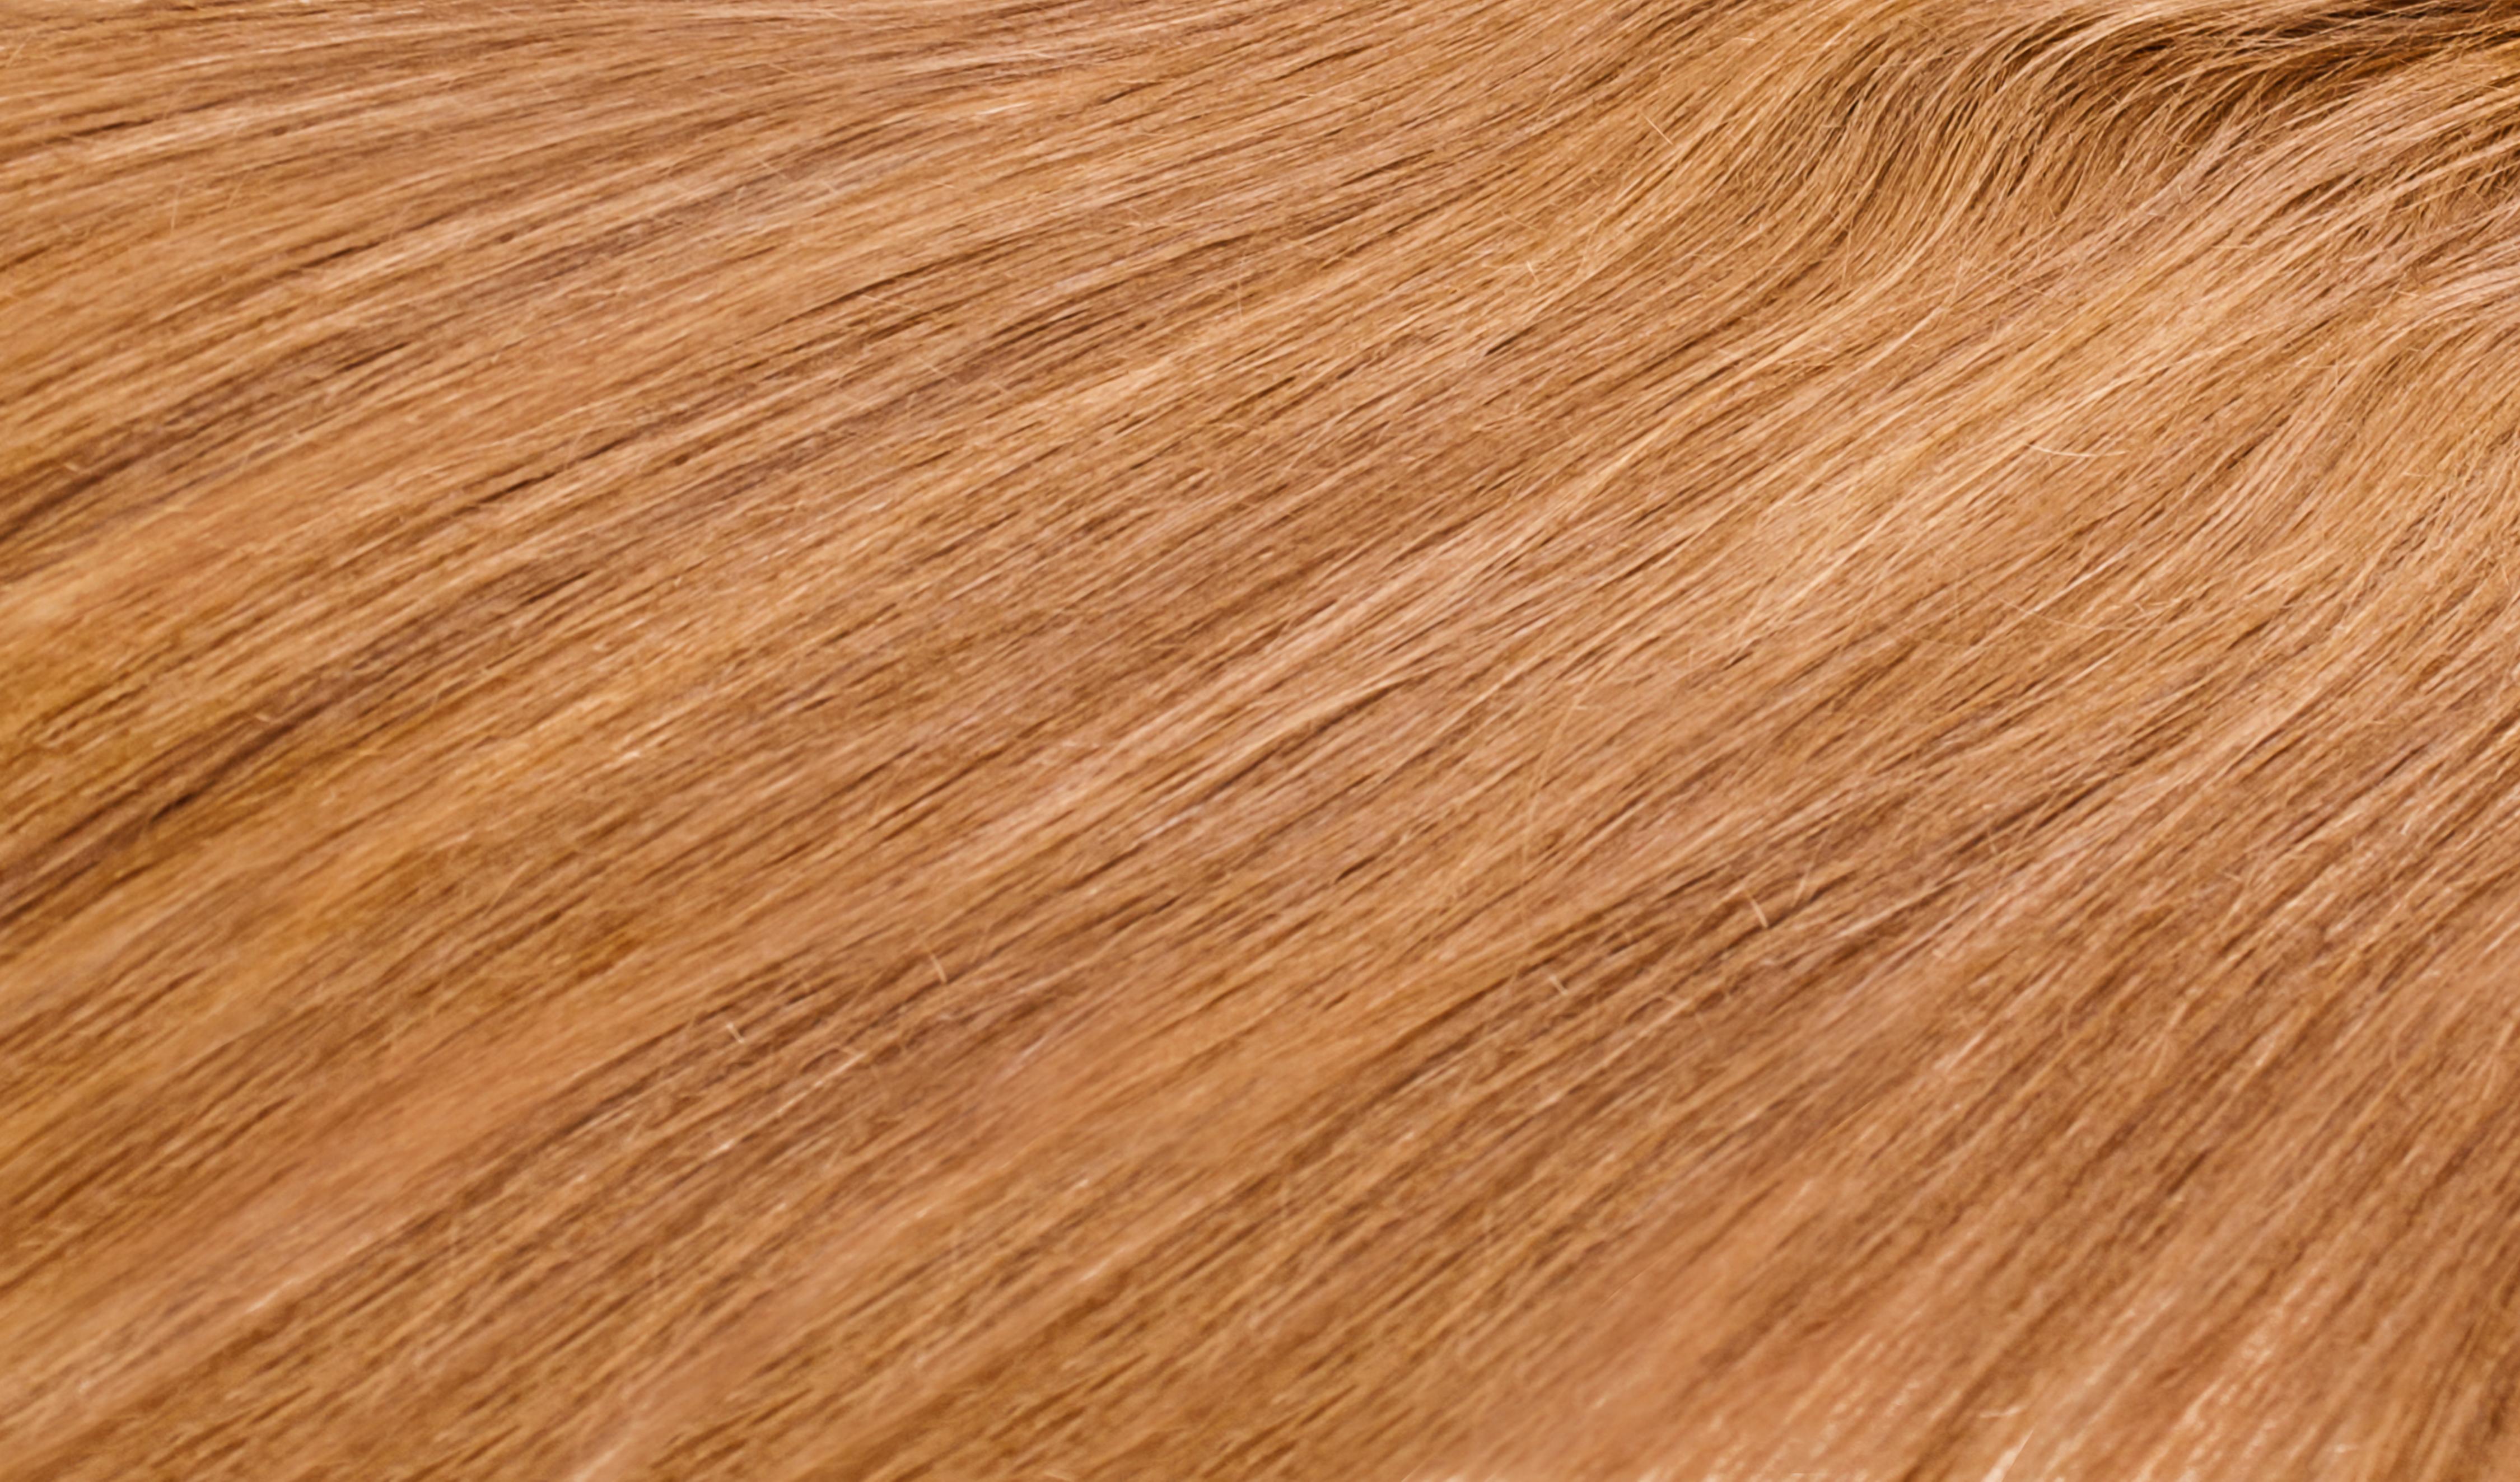 Blonde Hair Texture.